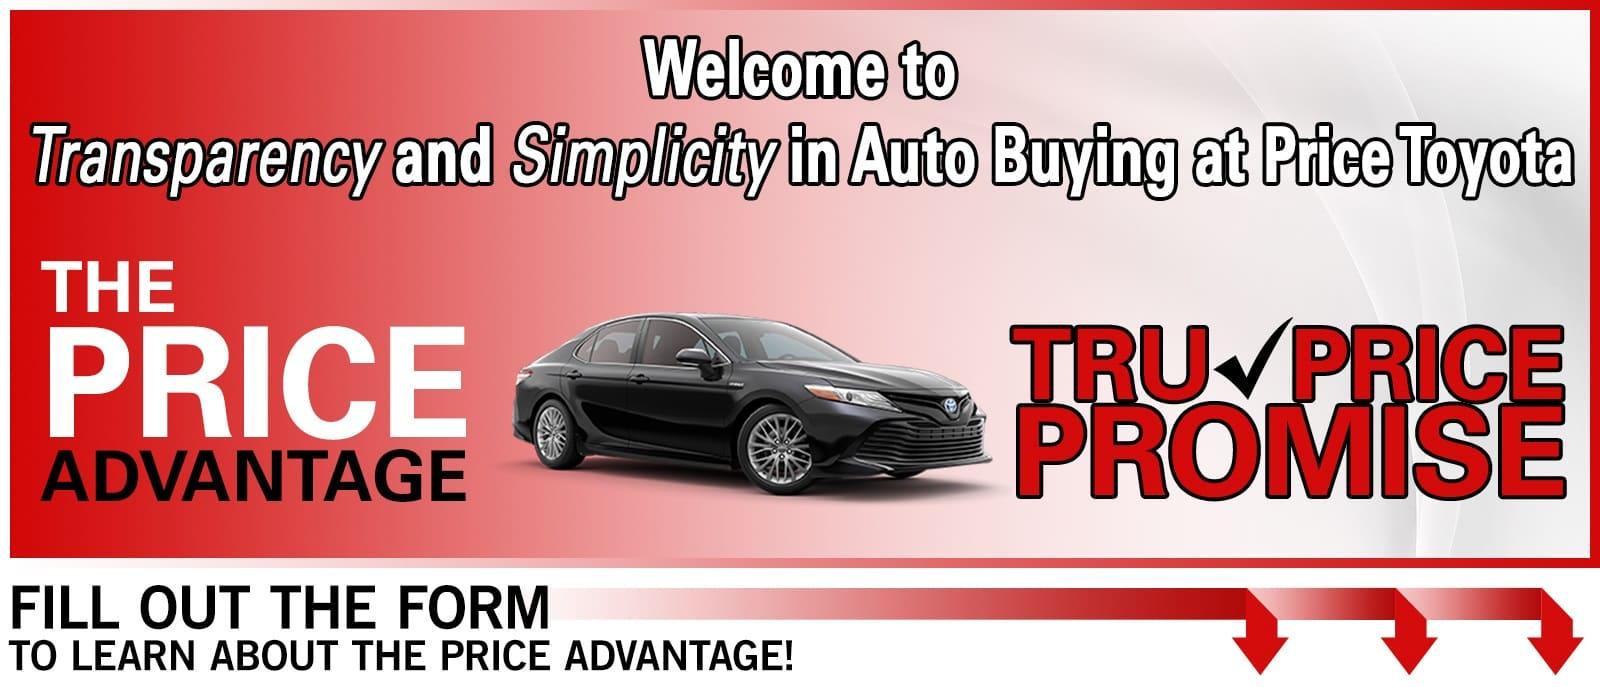 The Price Advantage Price Toyota Price Toyota